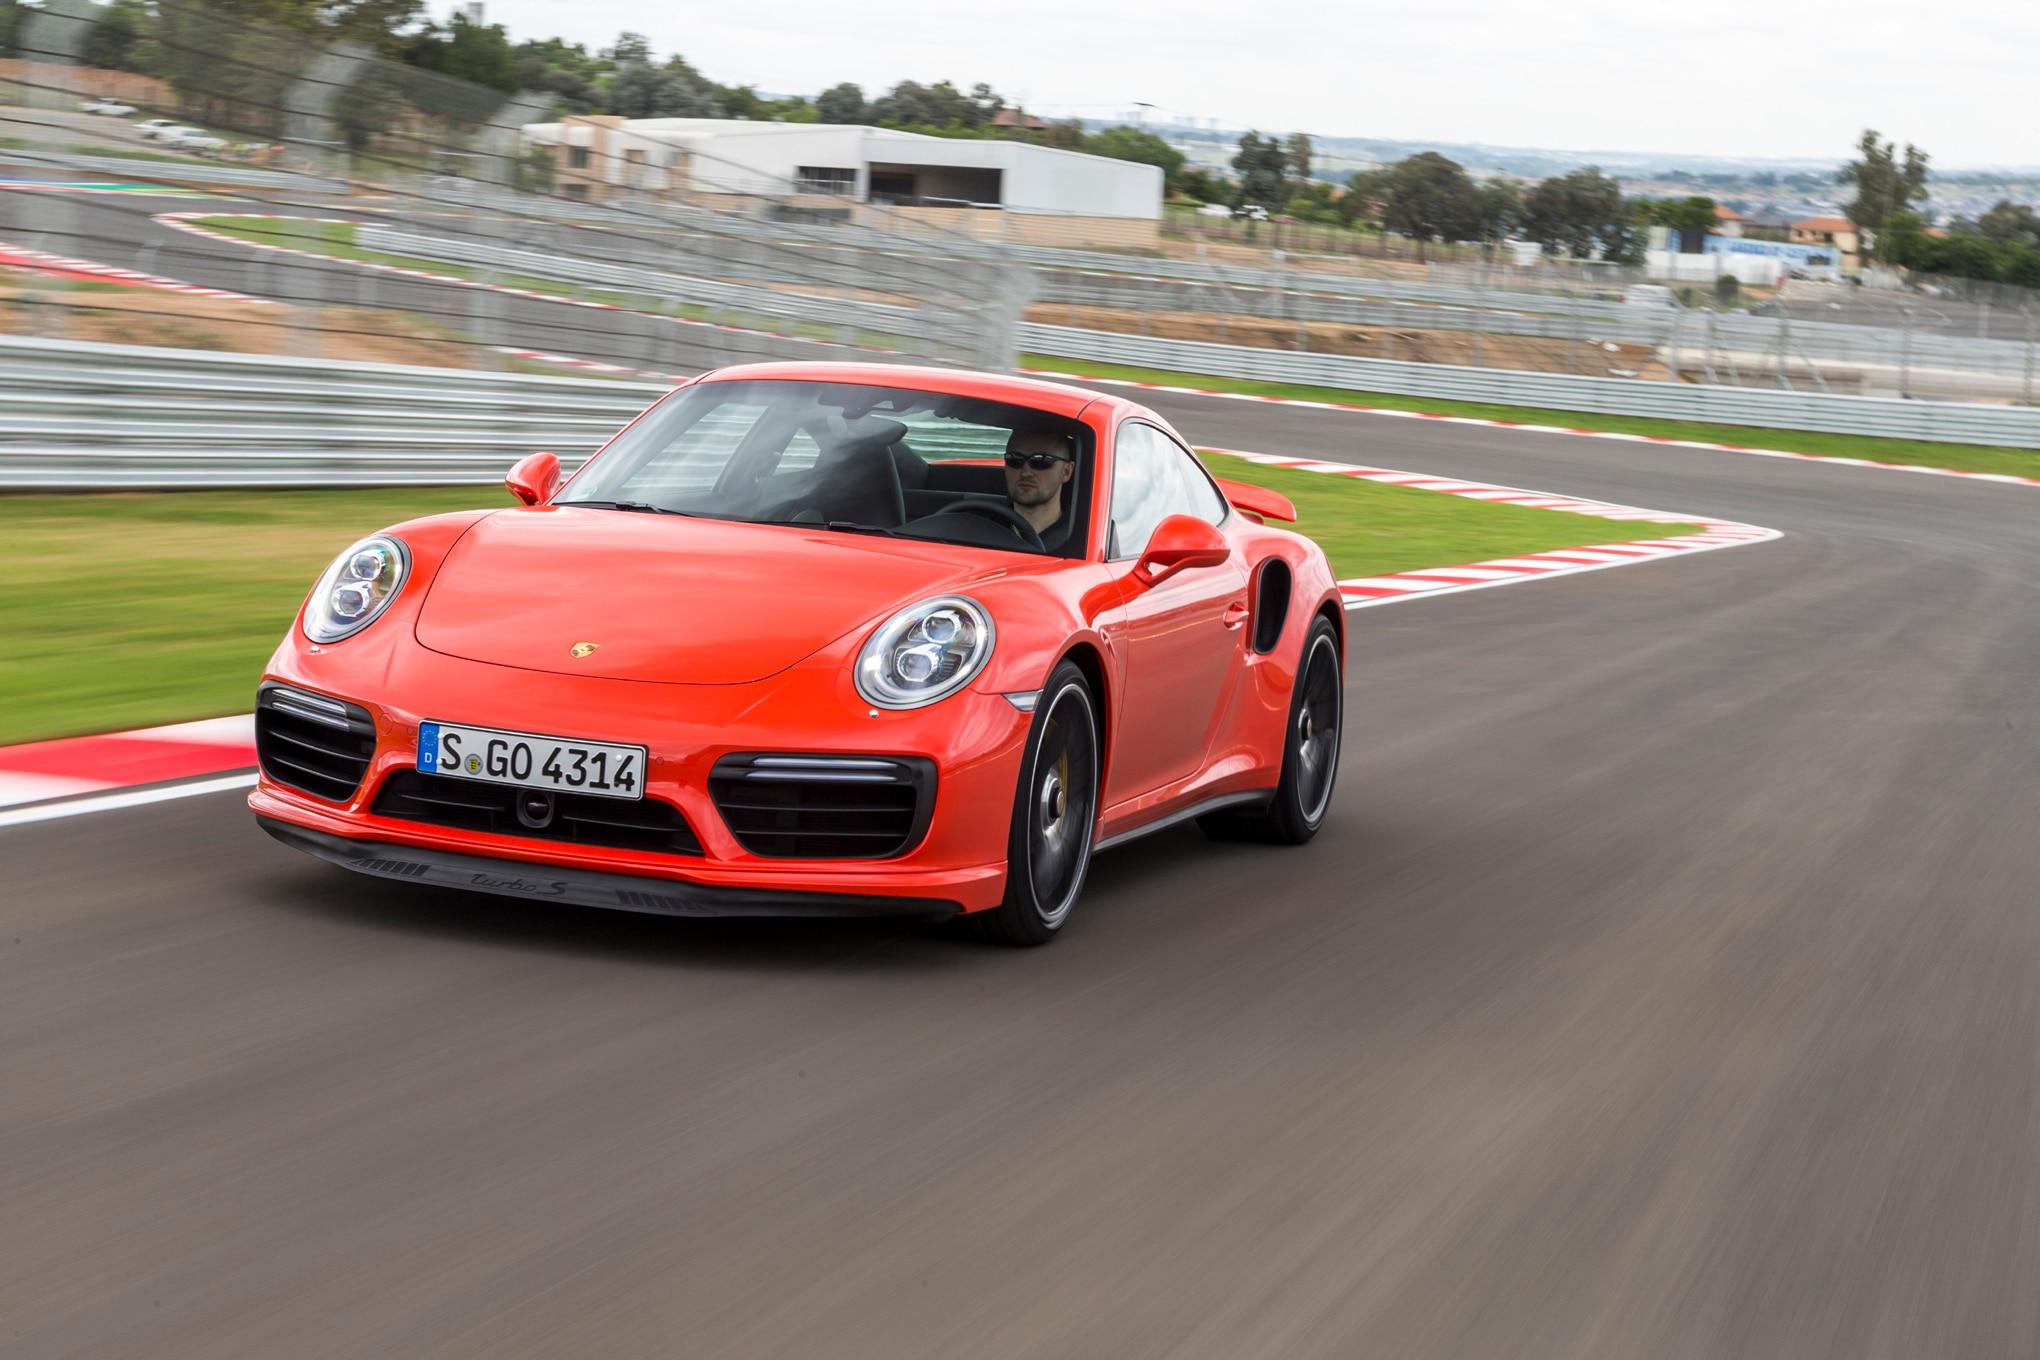 2017 Porsche 911 Turbo S Front Three Quarter In Motion 03